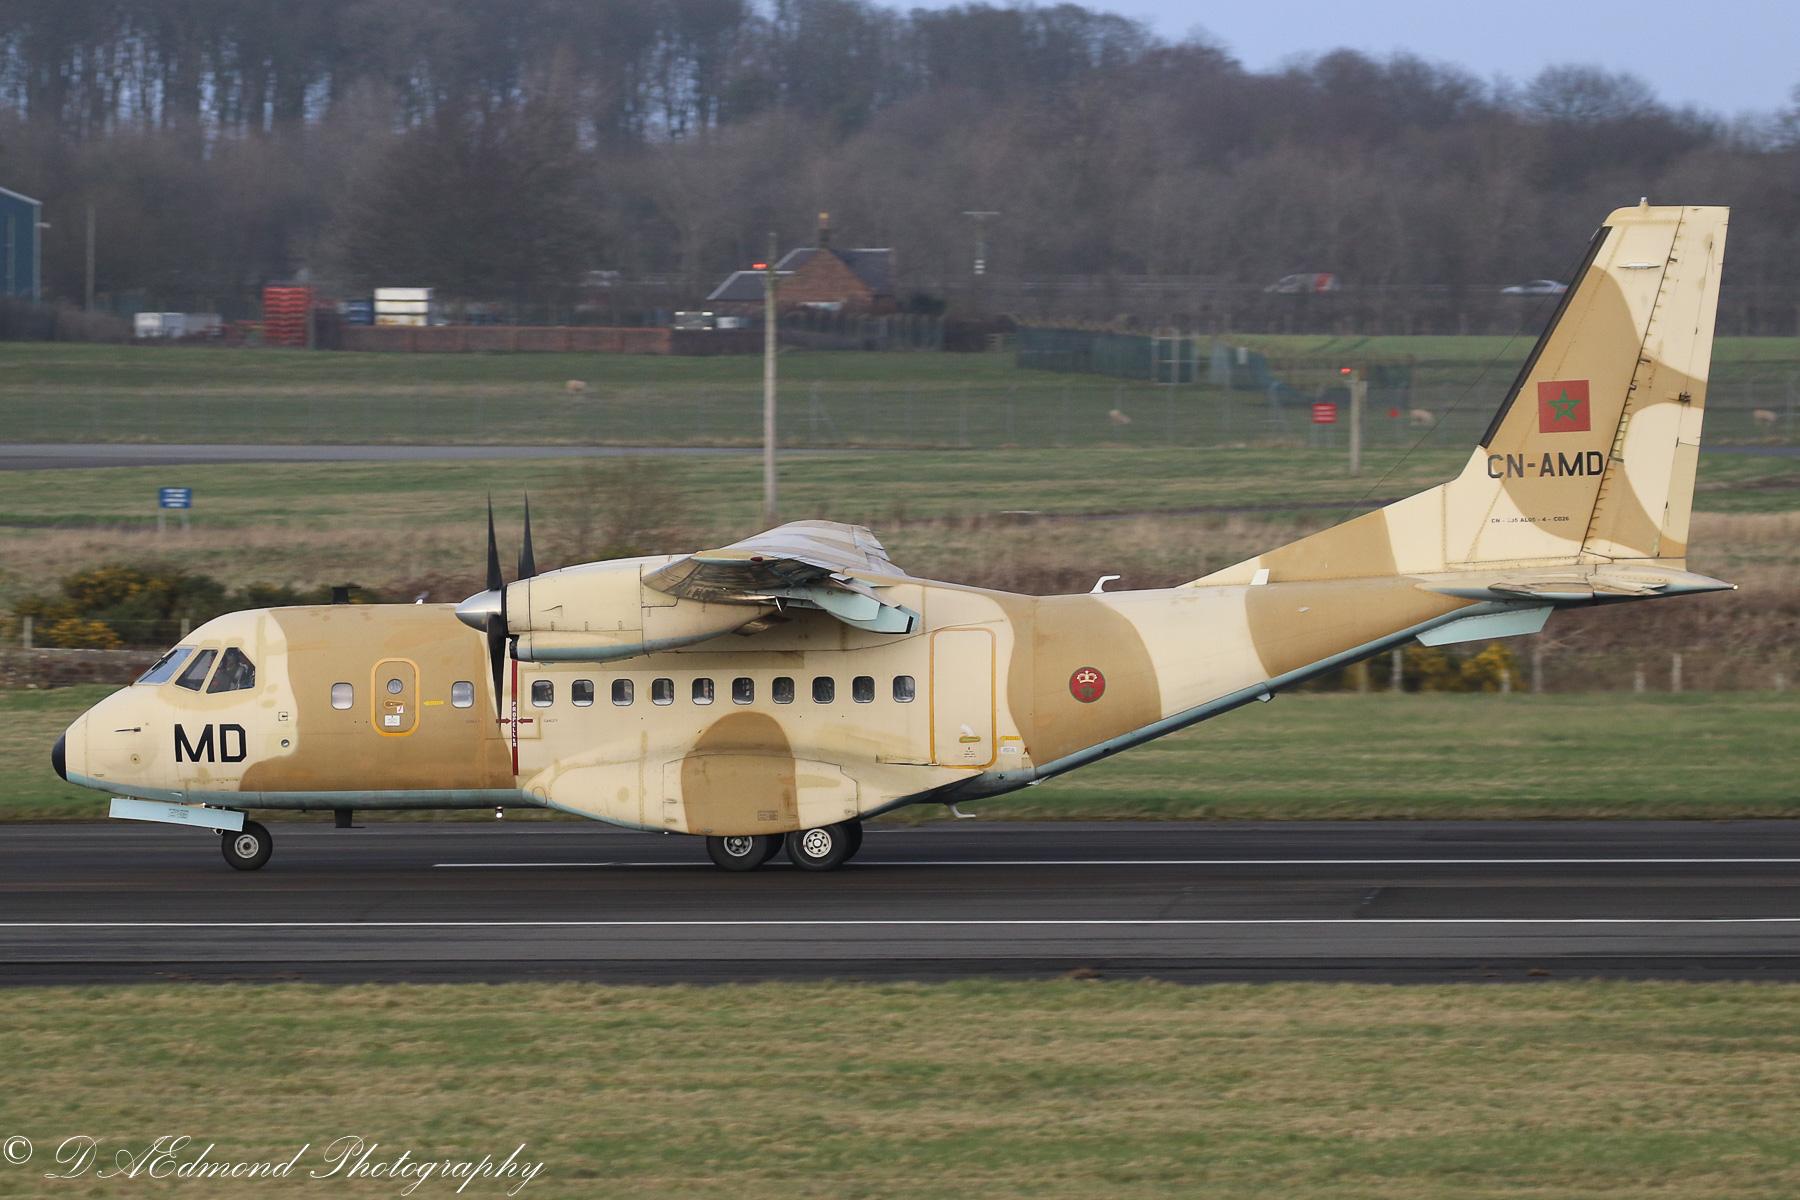 FRA: Photos d'avions de transport - Page 31 33248623221_82f7140c67_o